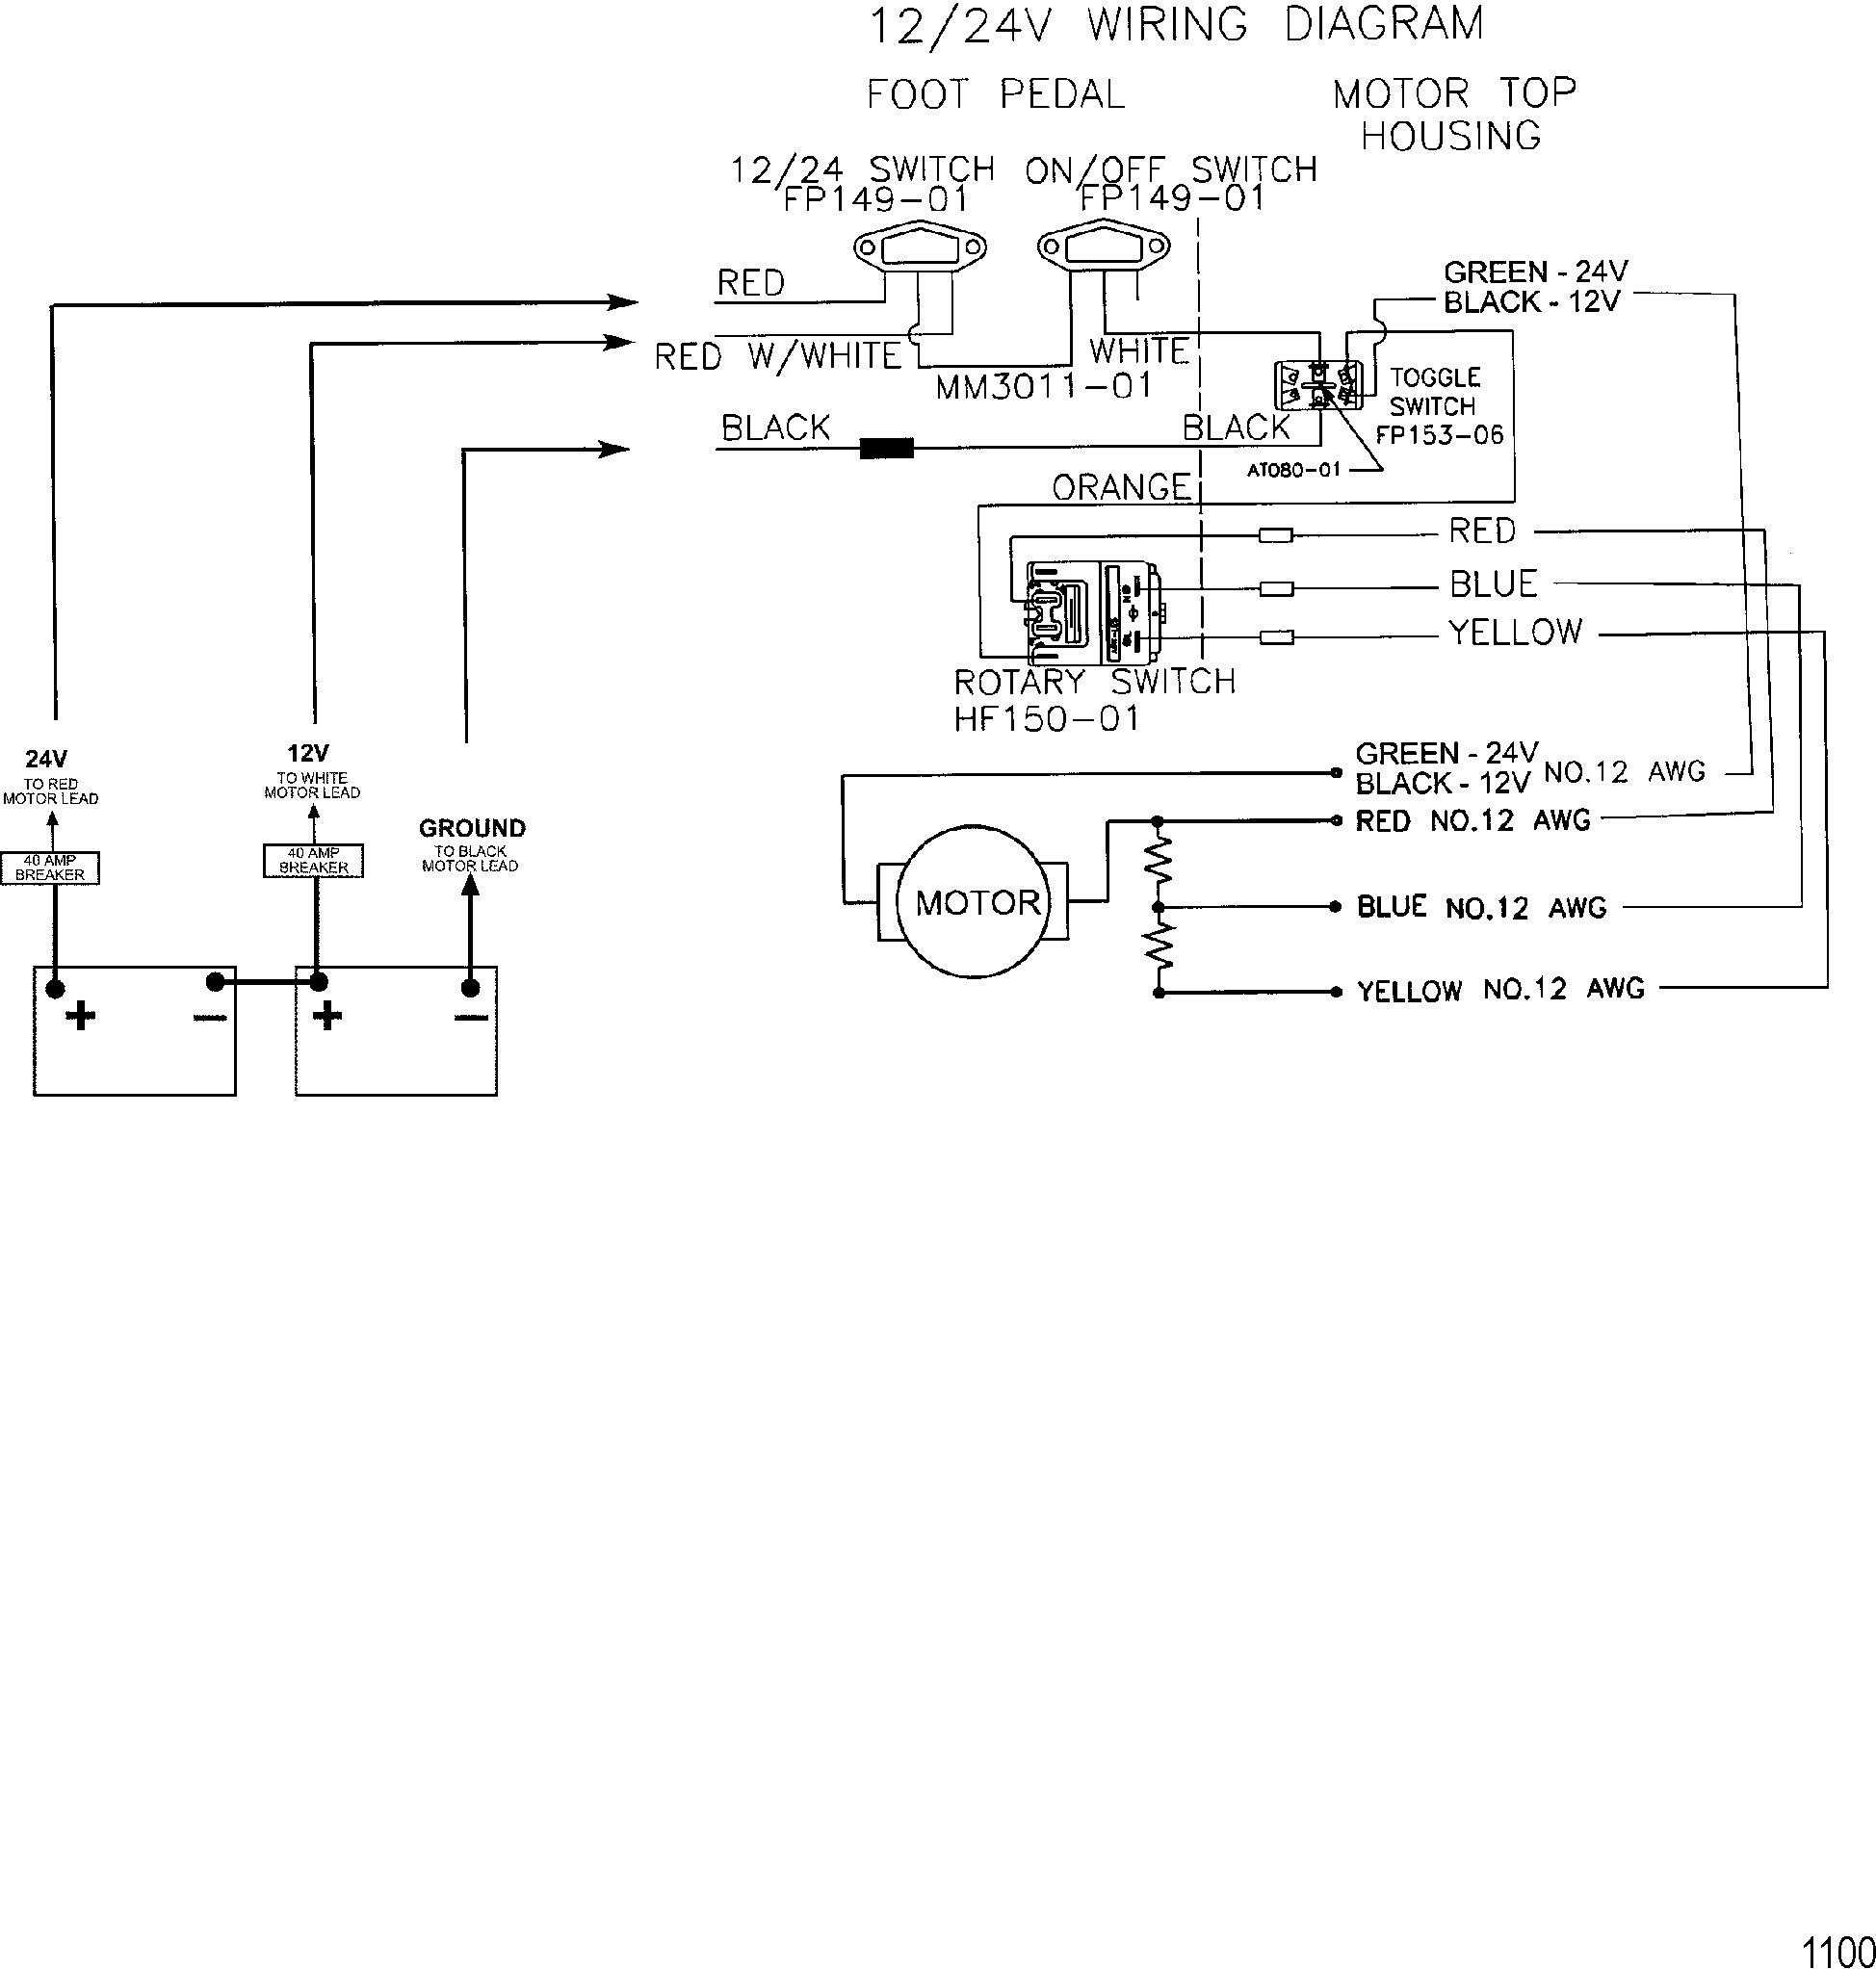 Minn Kota 36 Volt Battery Wiring Diagram